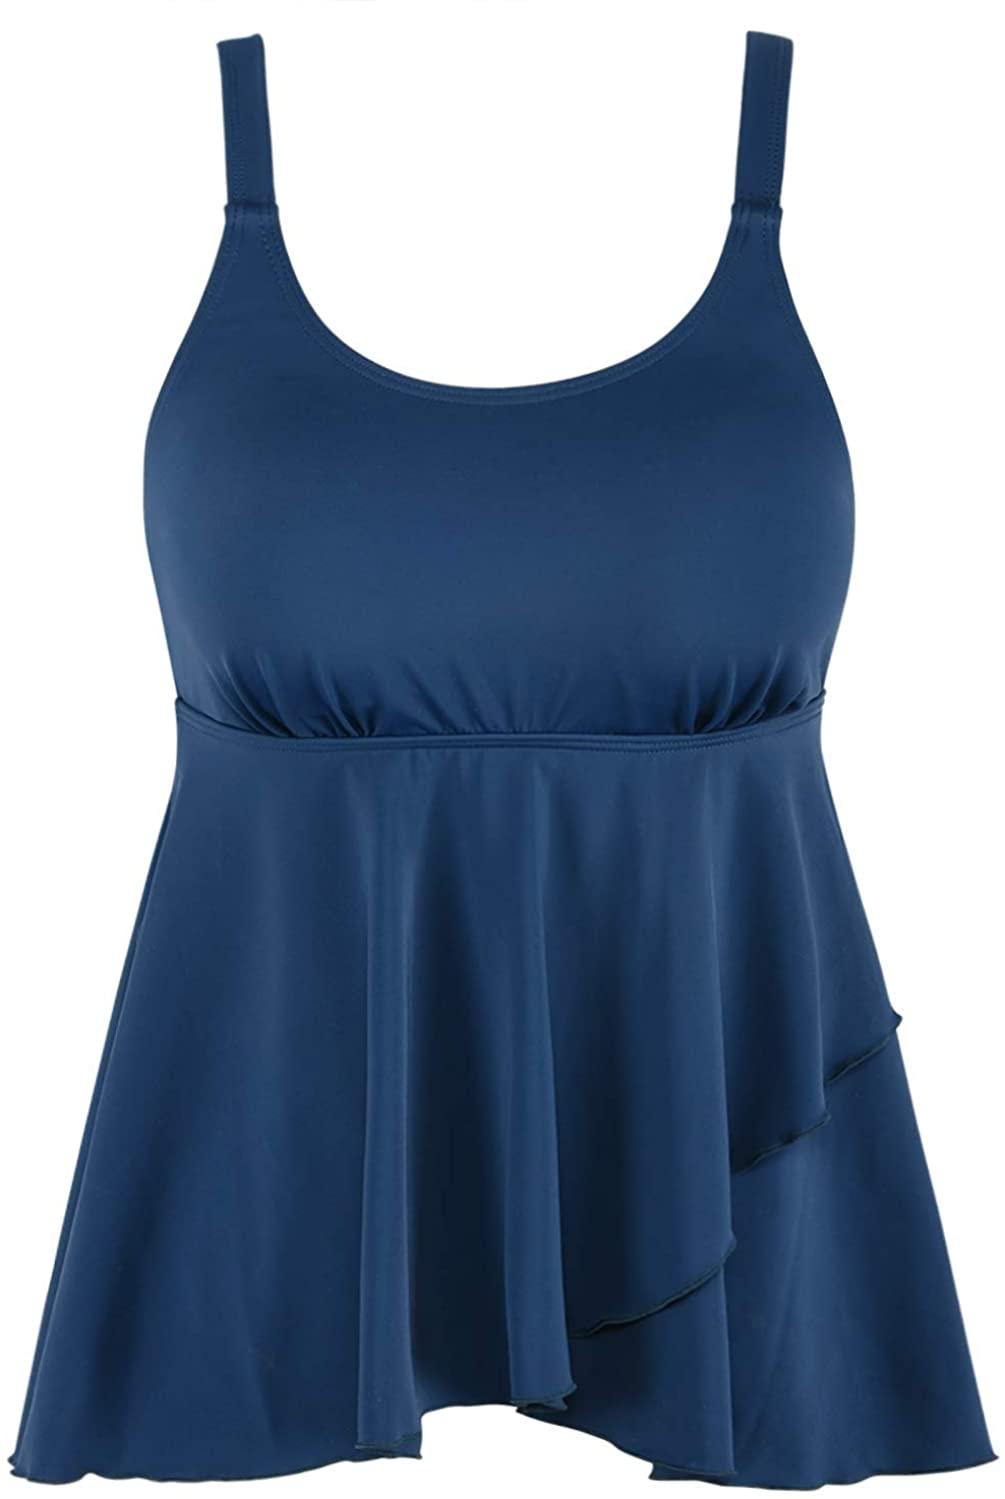 Septangle Women's Bandeau Flowy Swim Top Padded Swimwear Tankini Tummy Control Swimsuit Top